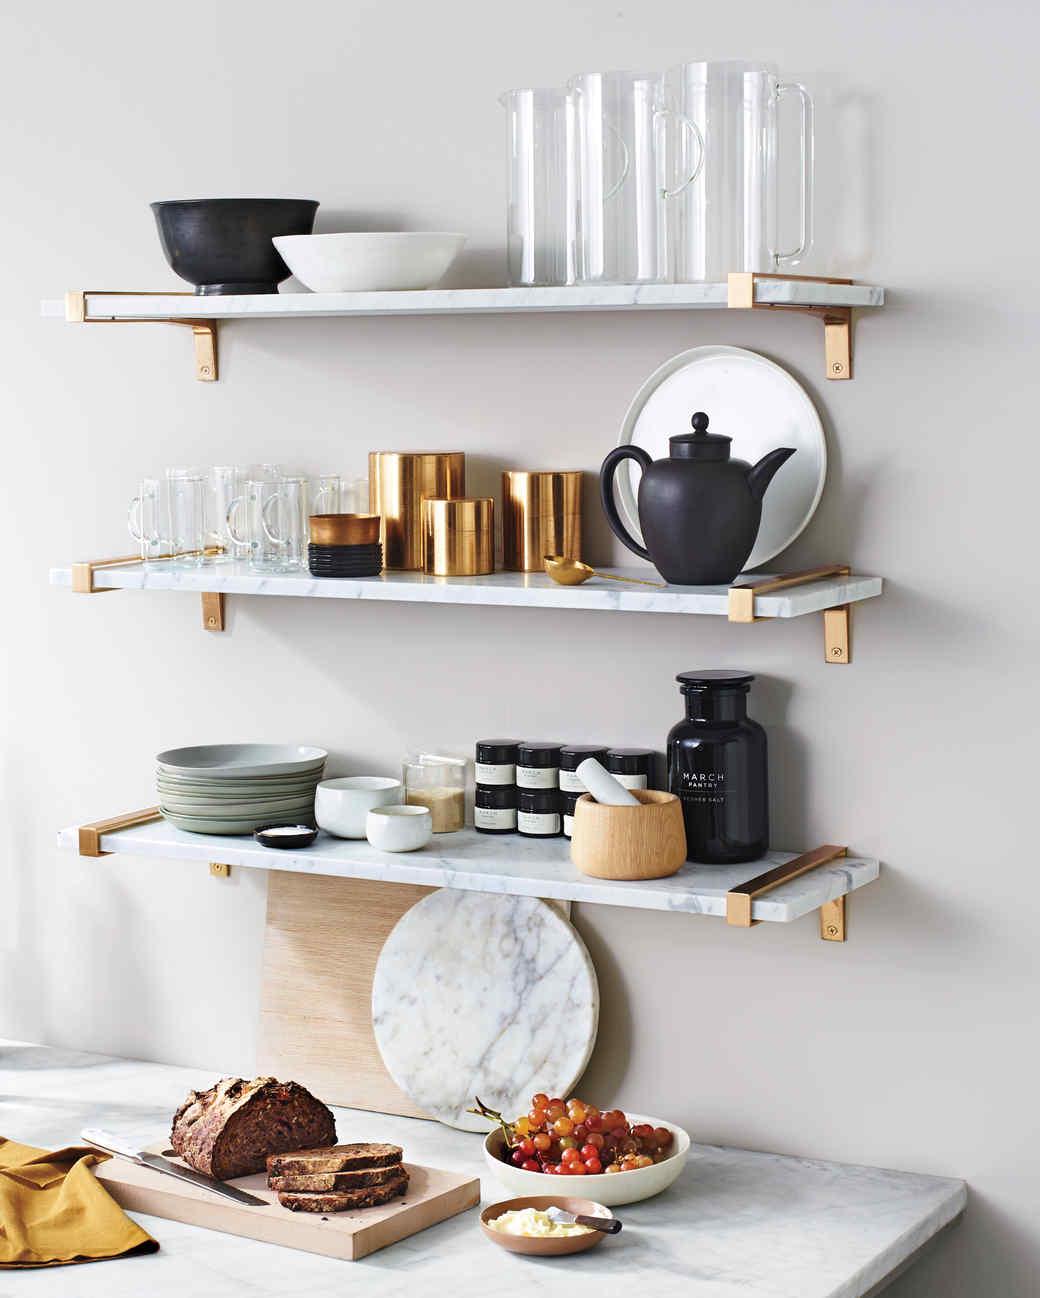 shelving-kitchen-174-d112185.jpg